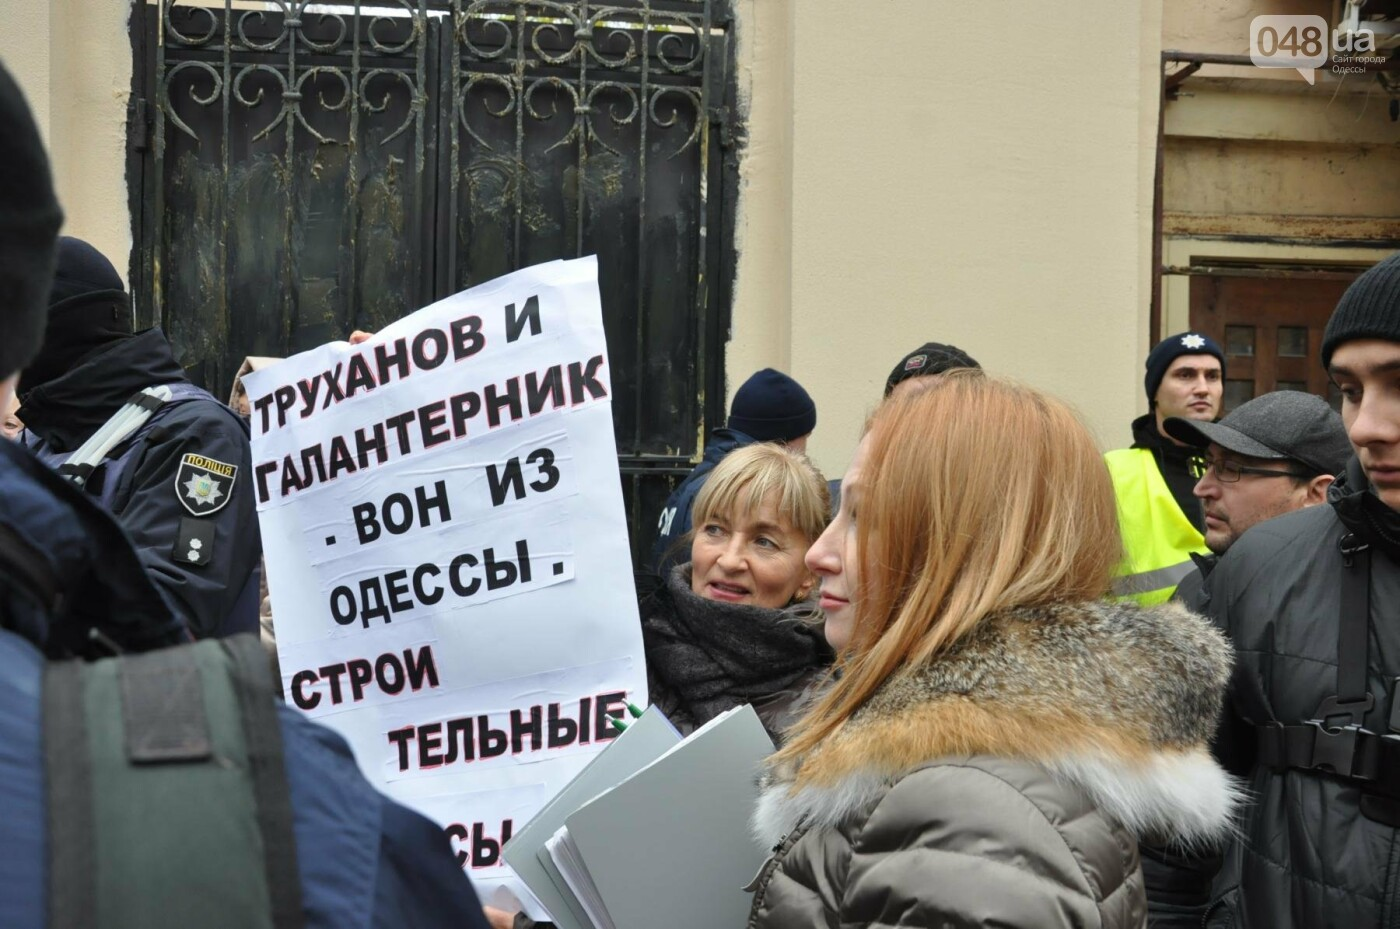 Около 5 сотен одесситов протестовали против застройки Горсада (ФОТО) , фото-14